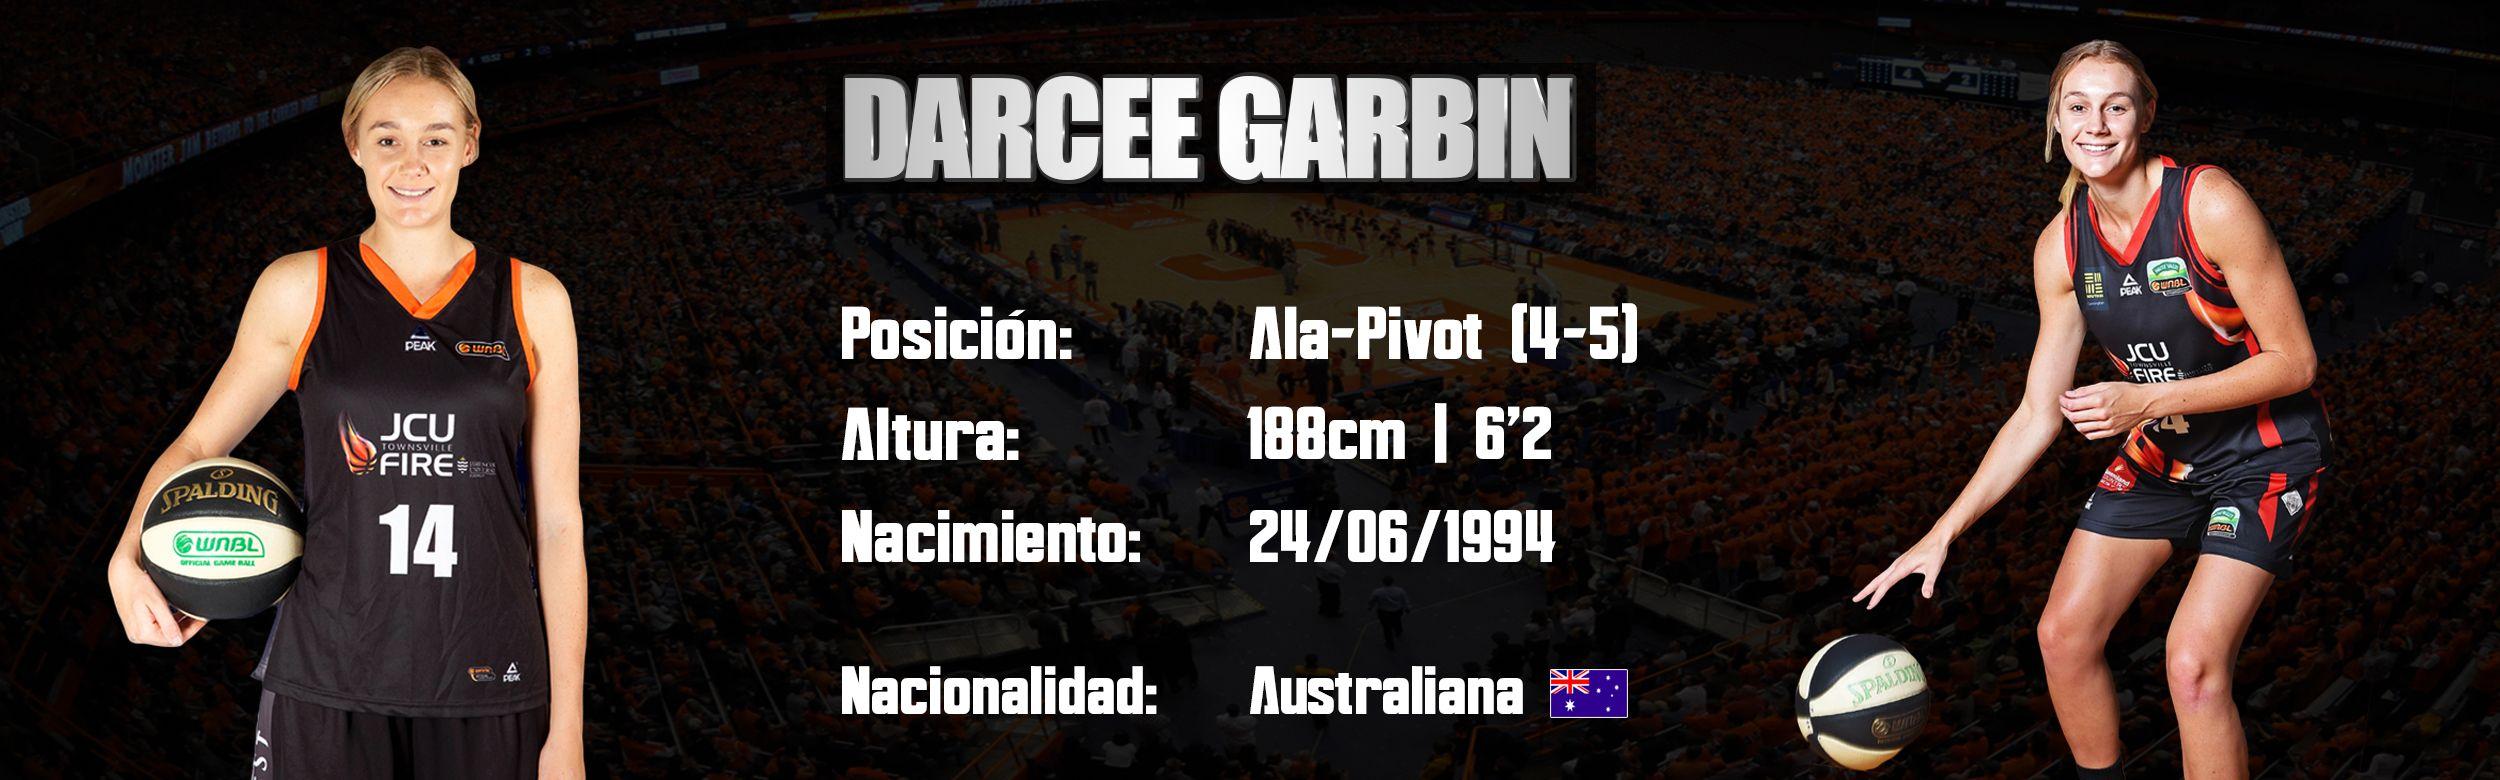 Darcee Garbin